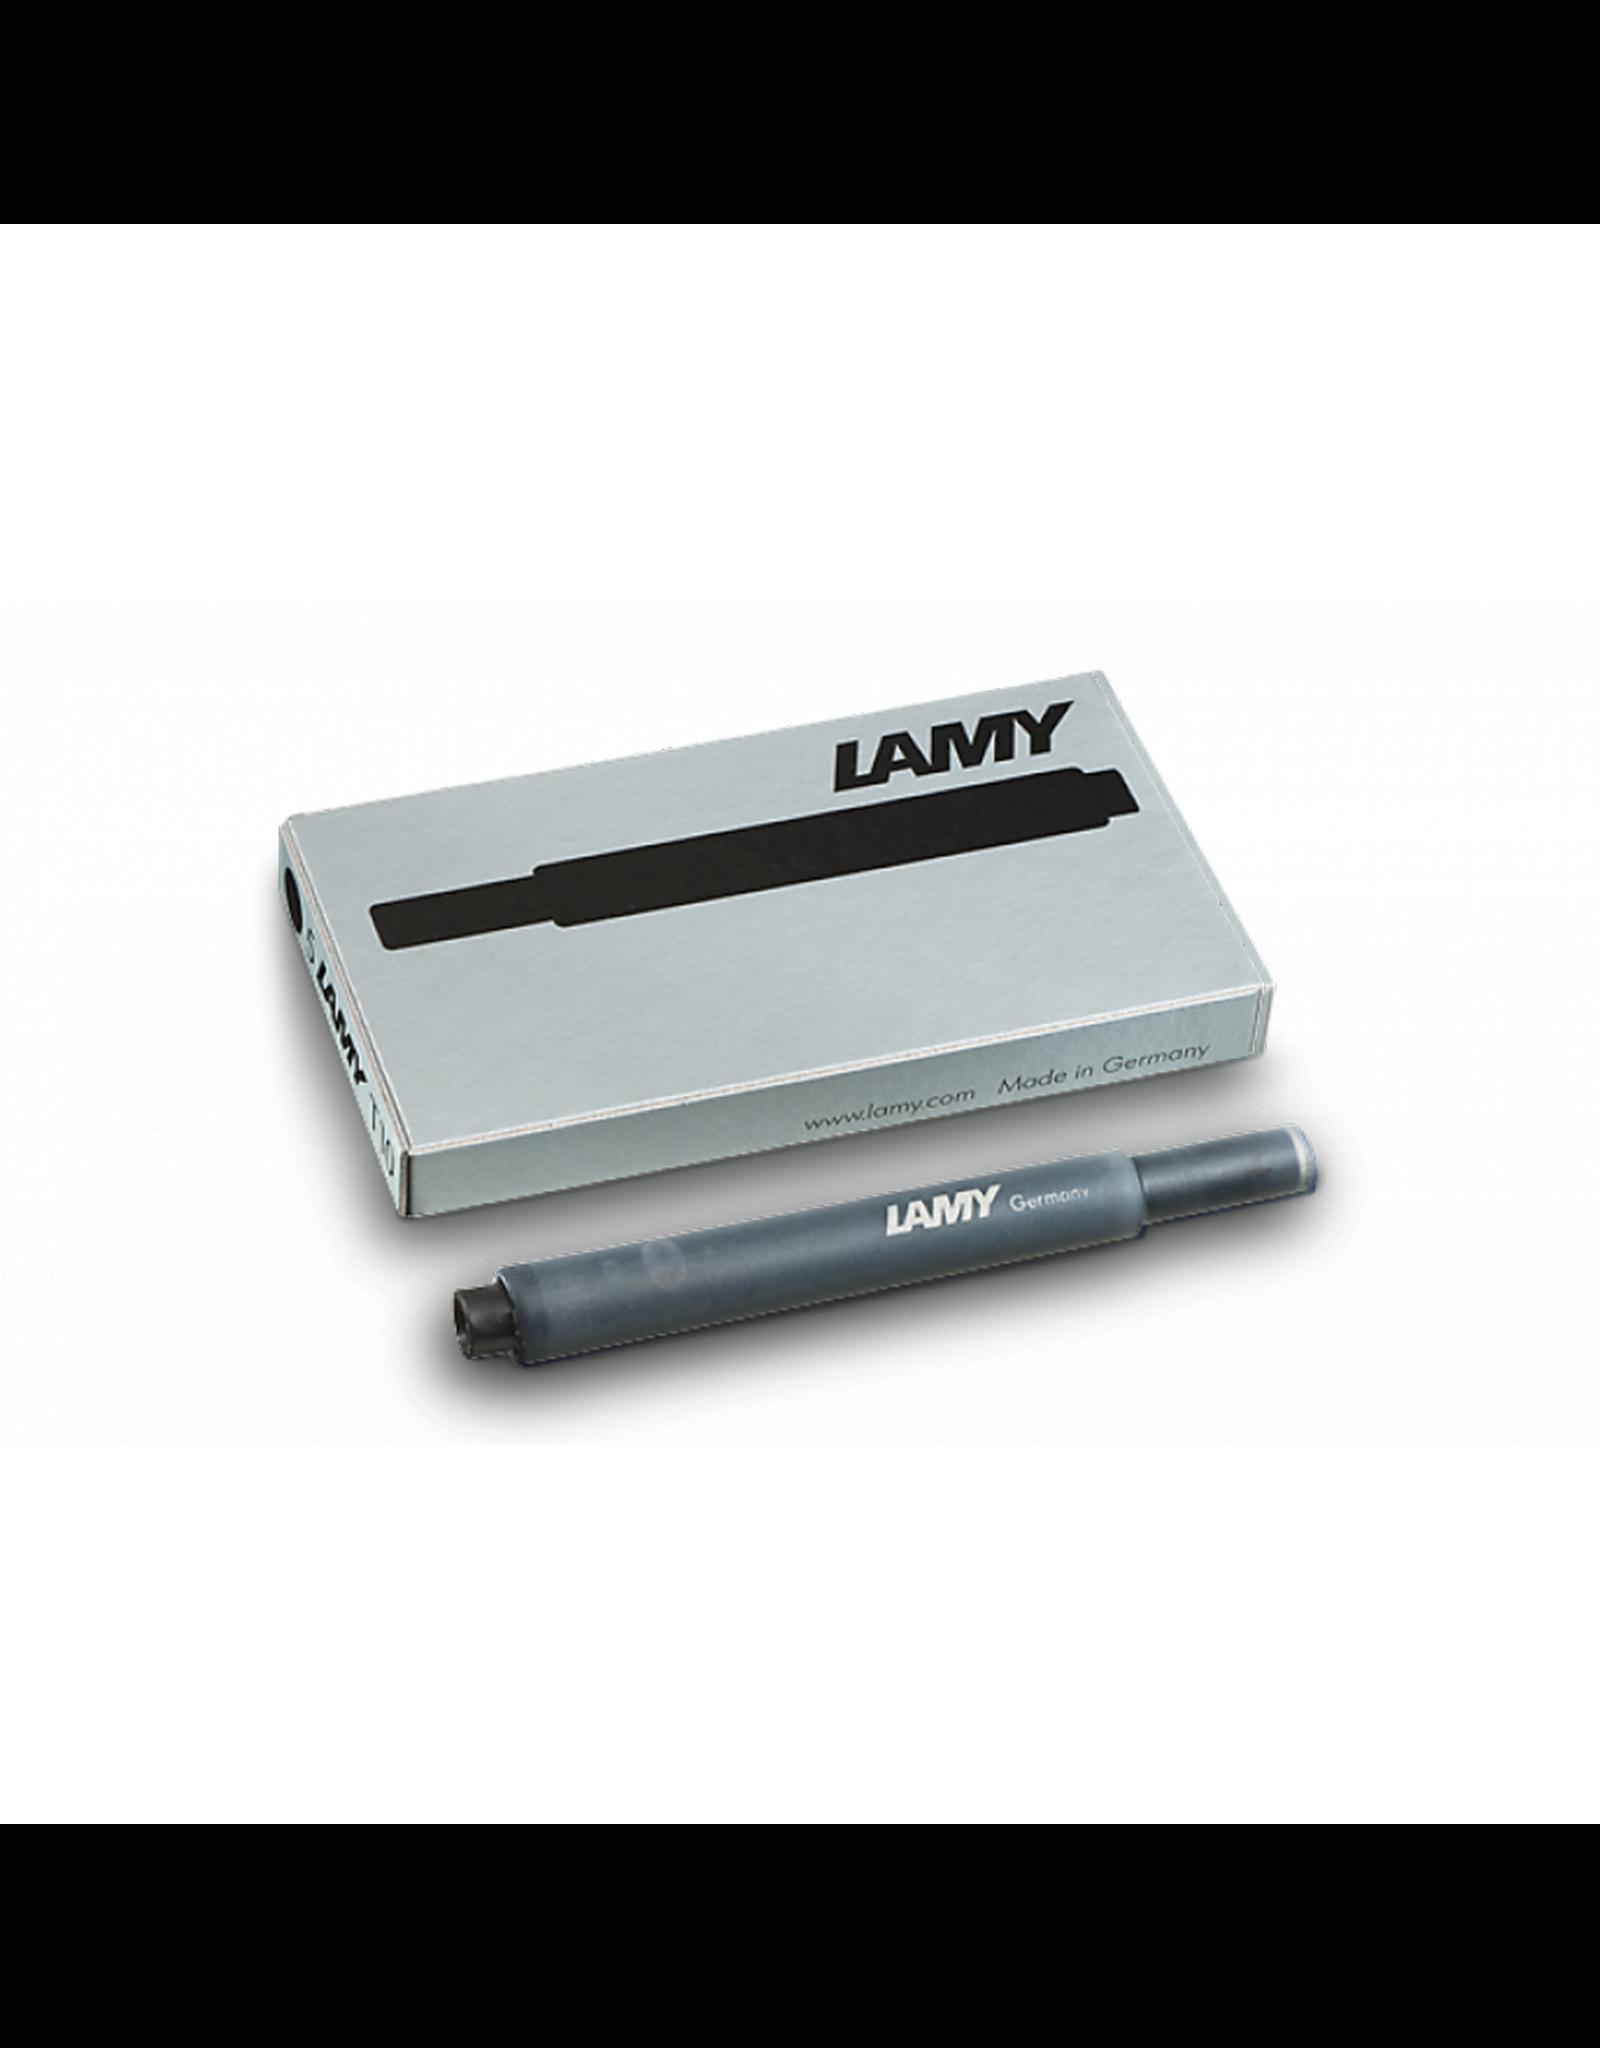 LAMY T10 Refill - Fountain Pen Ink Cartridges, Box of 5 (Black)